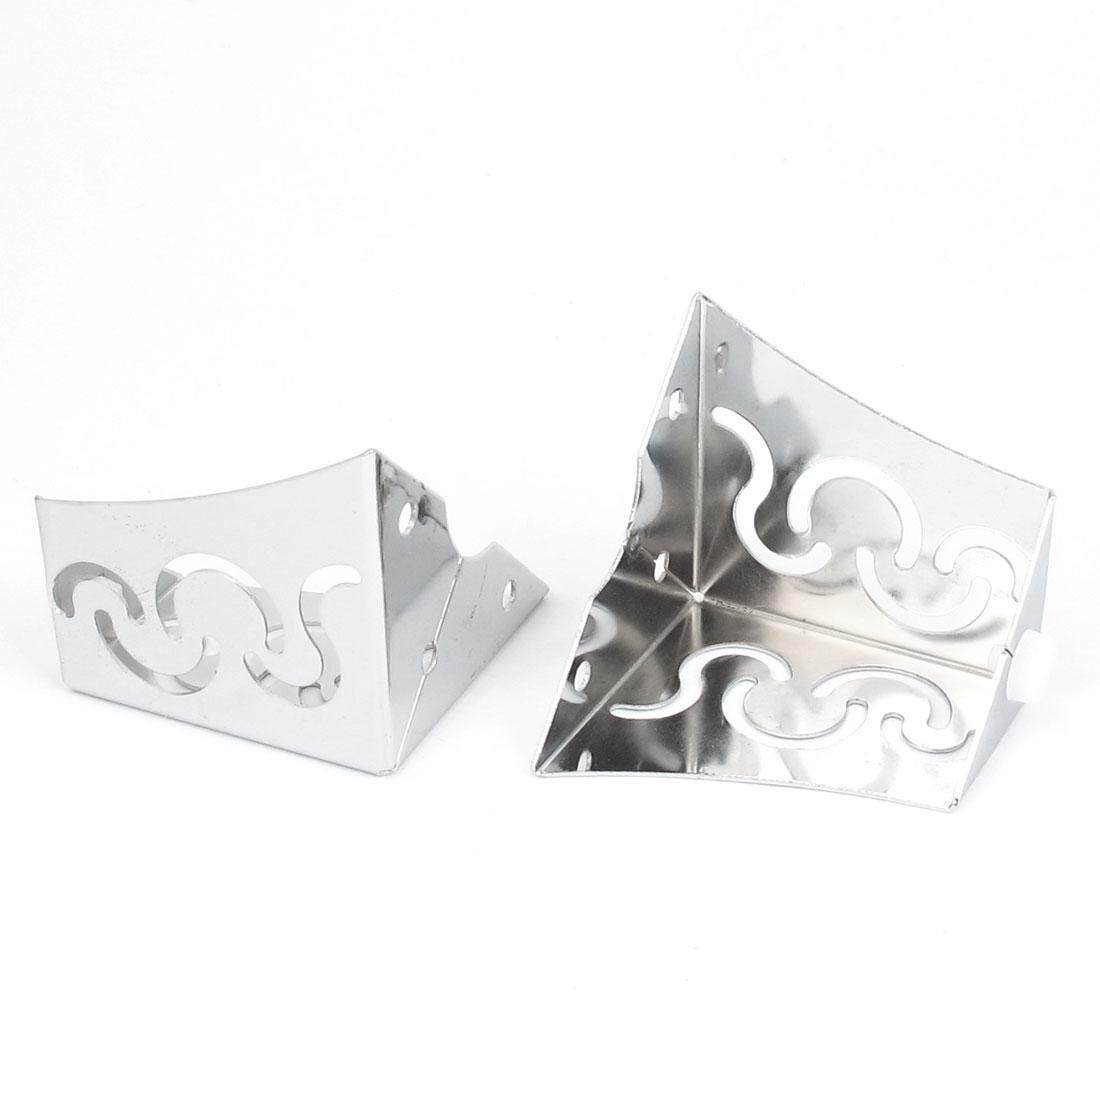 Hollow Out Furniture Feet Cabinet Sofa Leg Decor Silver Tone 2pcs